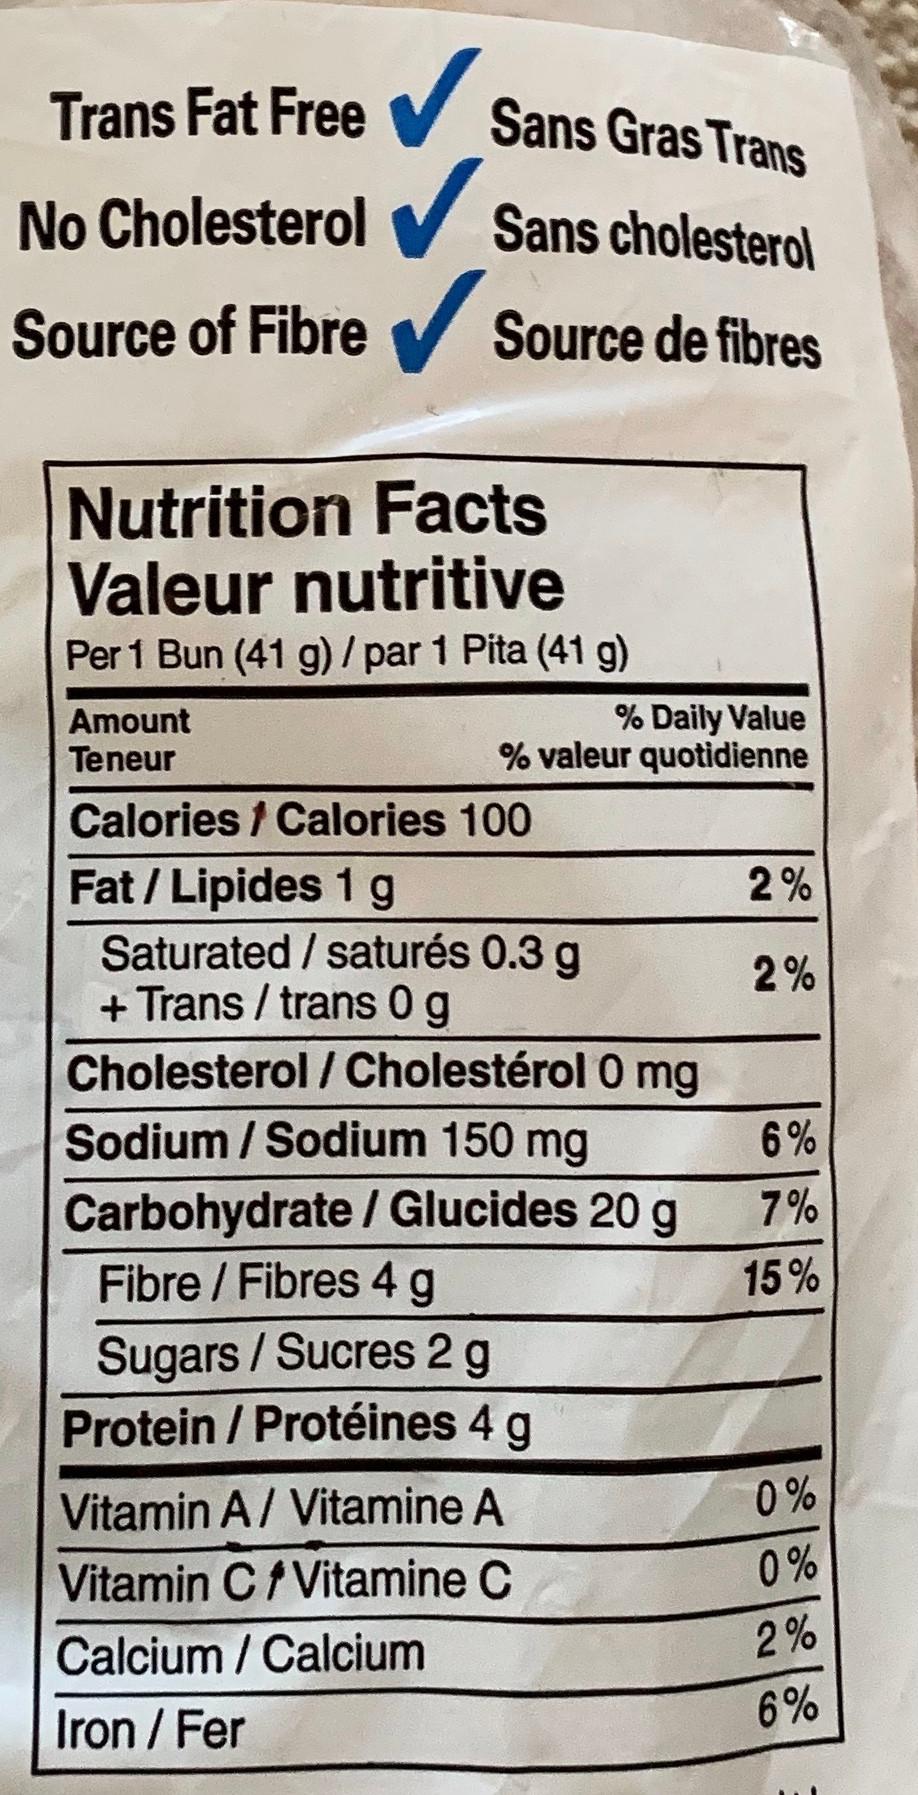 Costco Bakestone Brothers Multigrain Thin Bun Nutrition